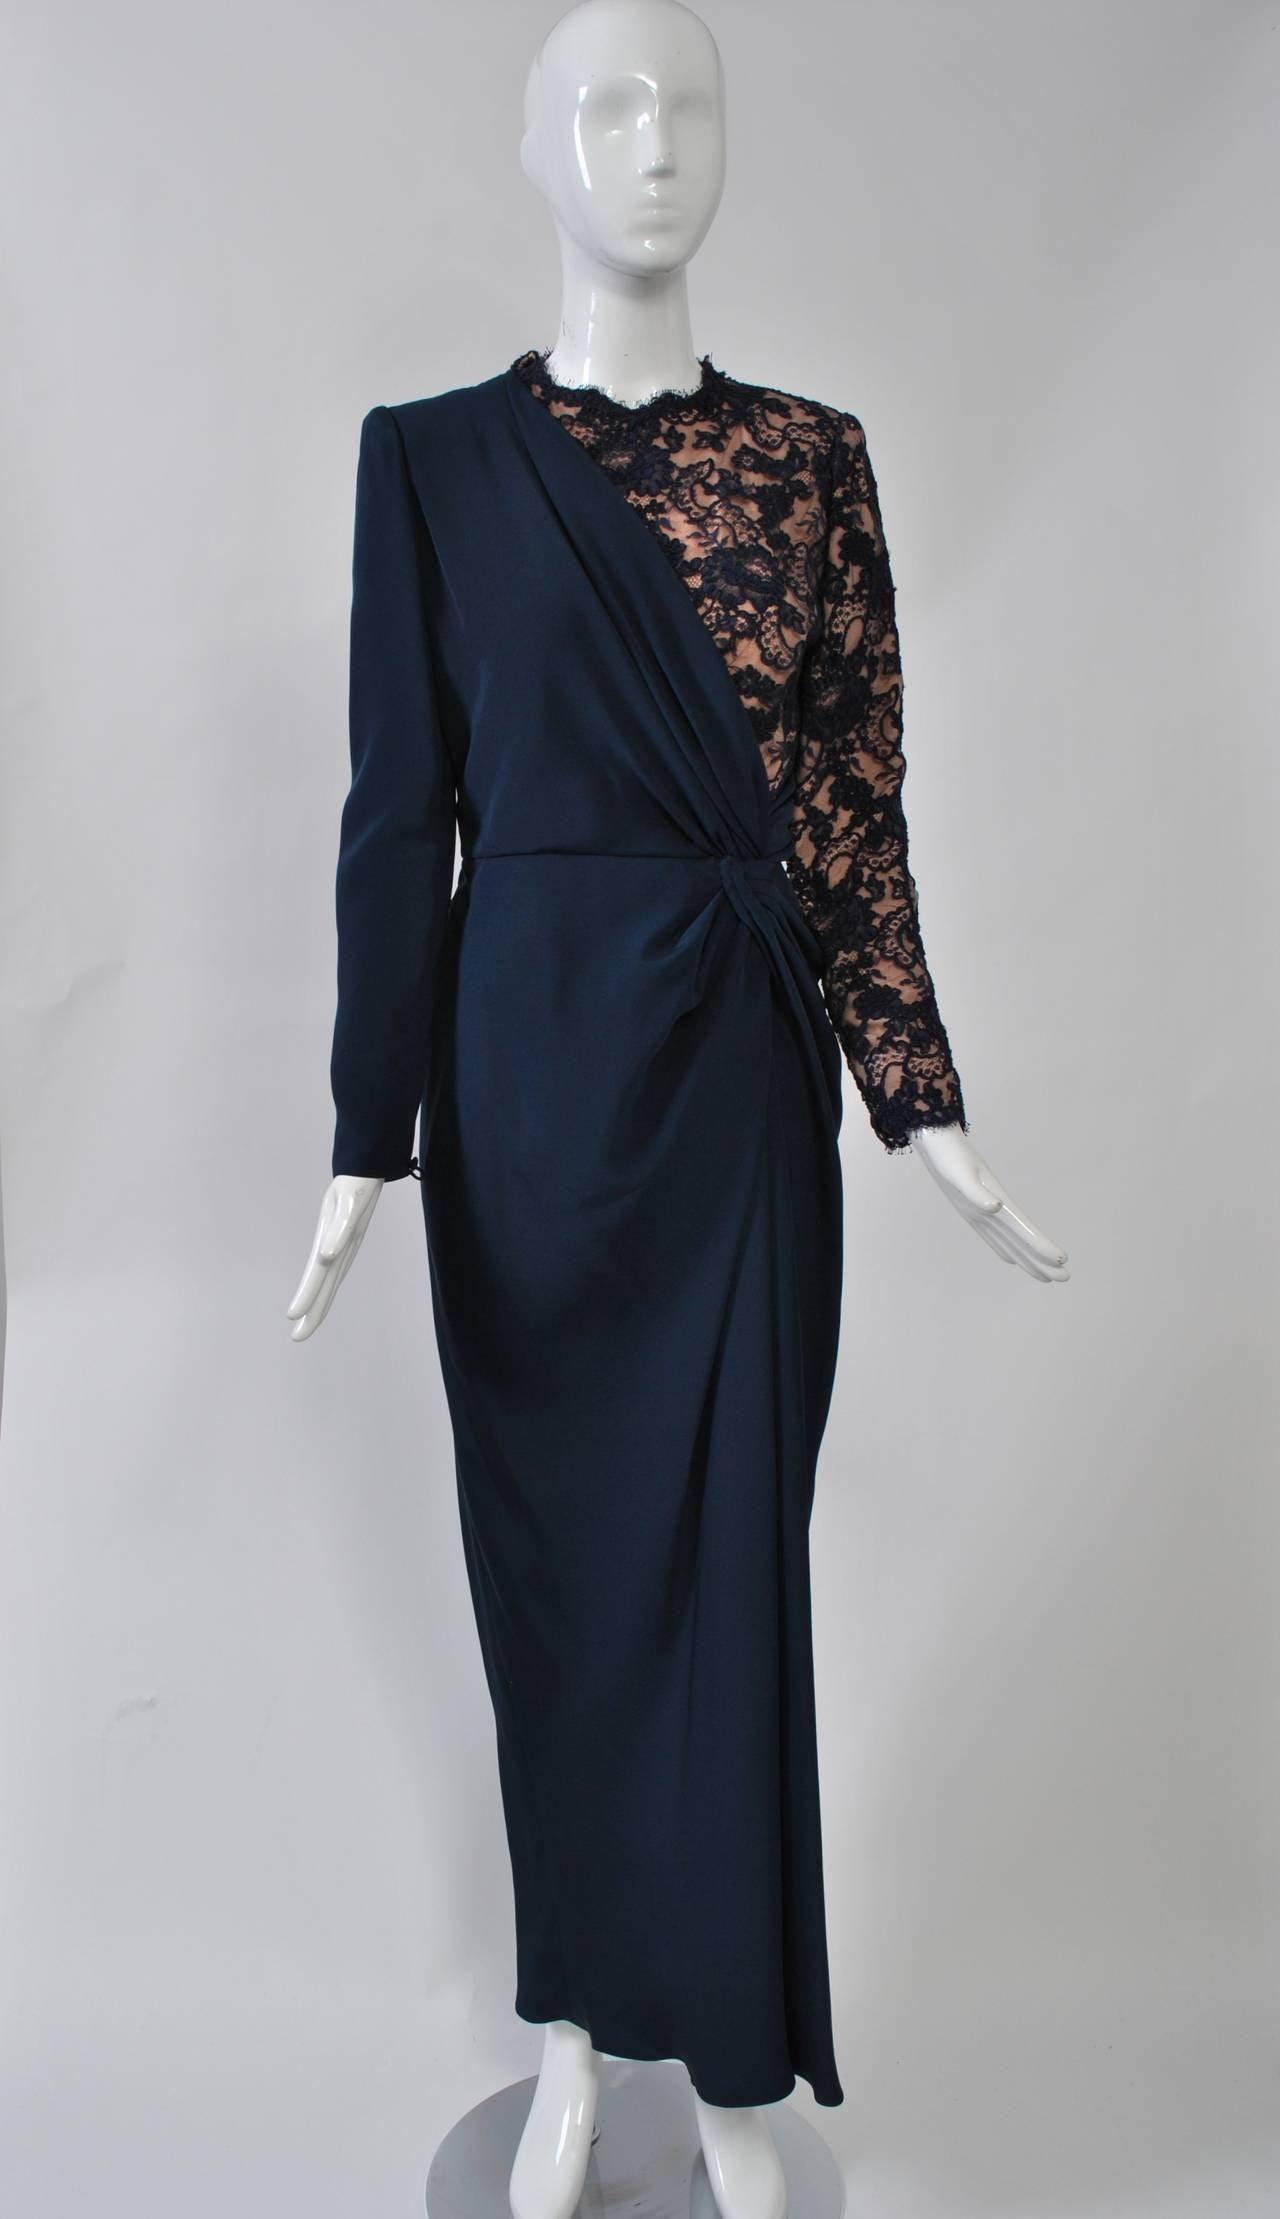 Carolina Herrera Navy Silk/Lace Gown at 1stdibs